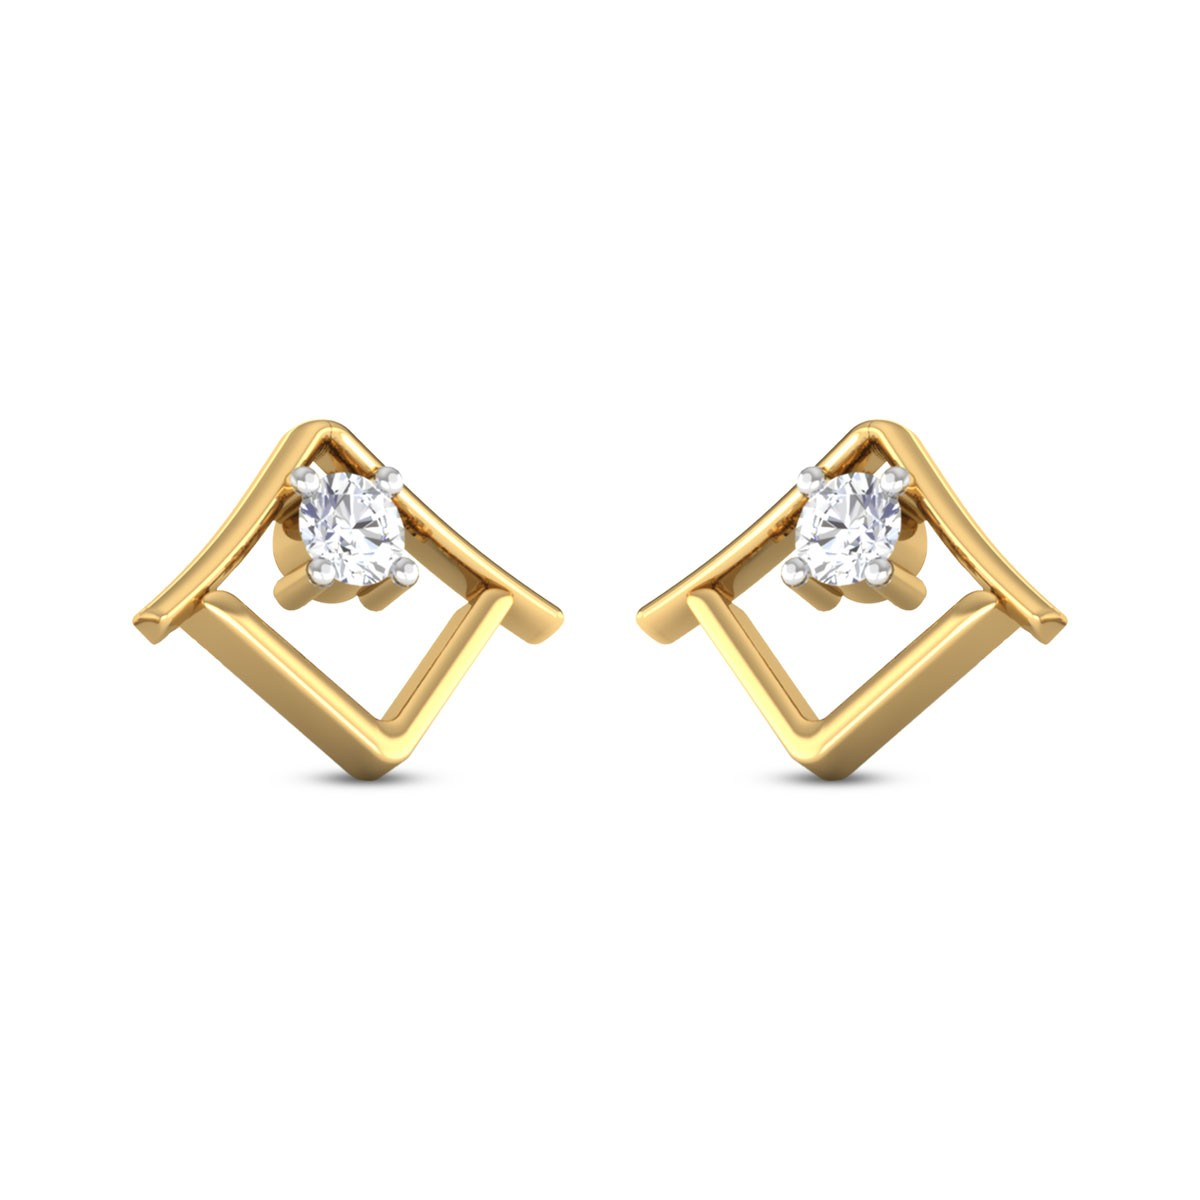 Sadia Diamond Earrings